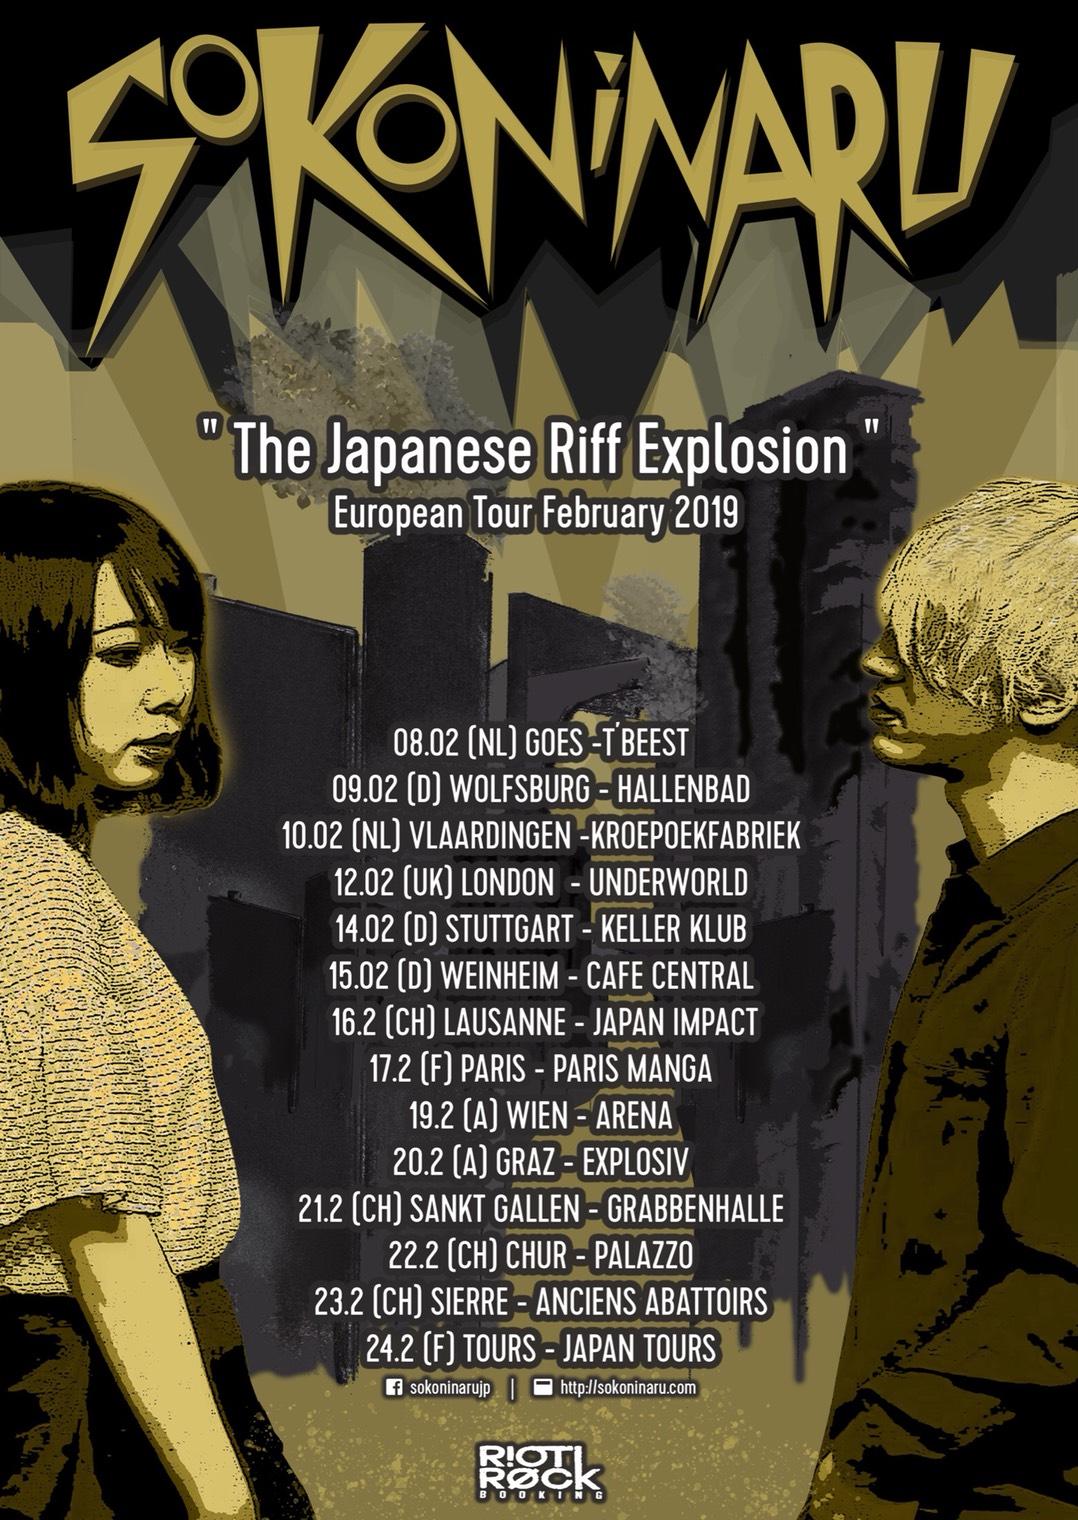 Sokoninaru - The Japanese Riff Explosion Sokoninaru European Tour 2019